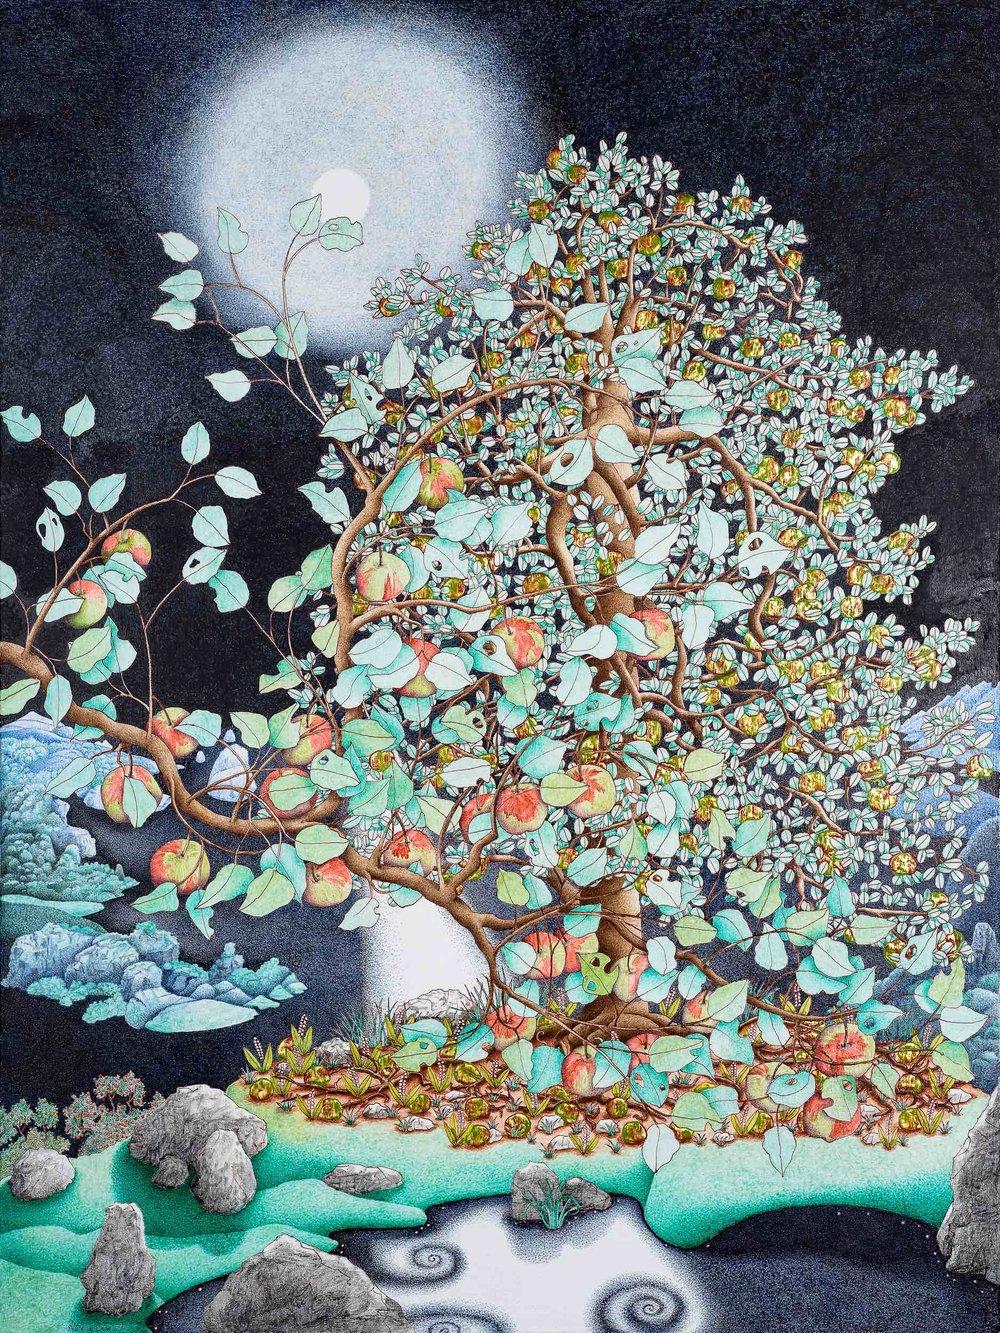 Michael Eade.  Full Moon 月圆 , Egg tempera, raised 23k gold leaf, oil on canvas, 40 x 30 in., (101.6 x 76.2 cm), 2012